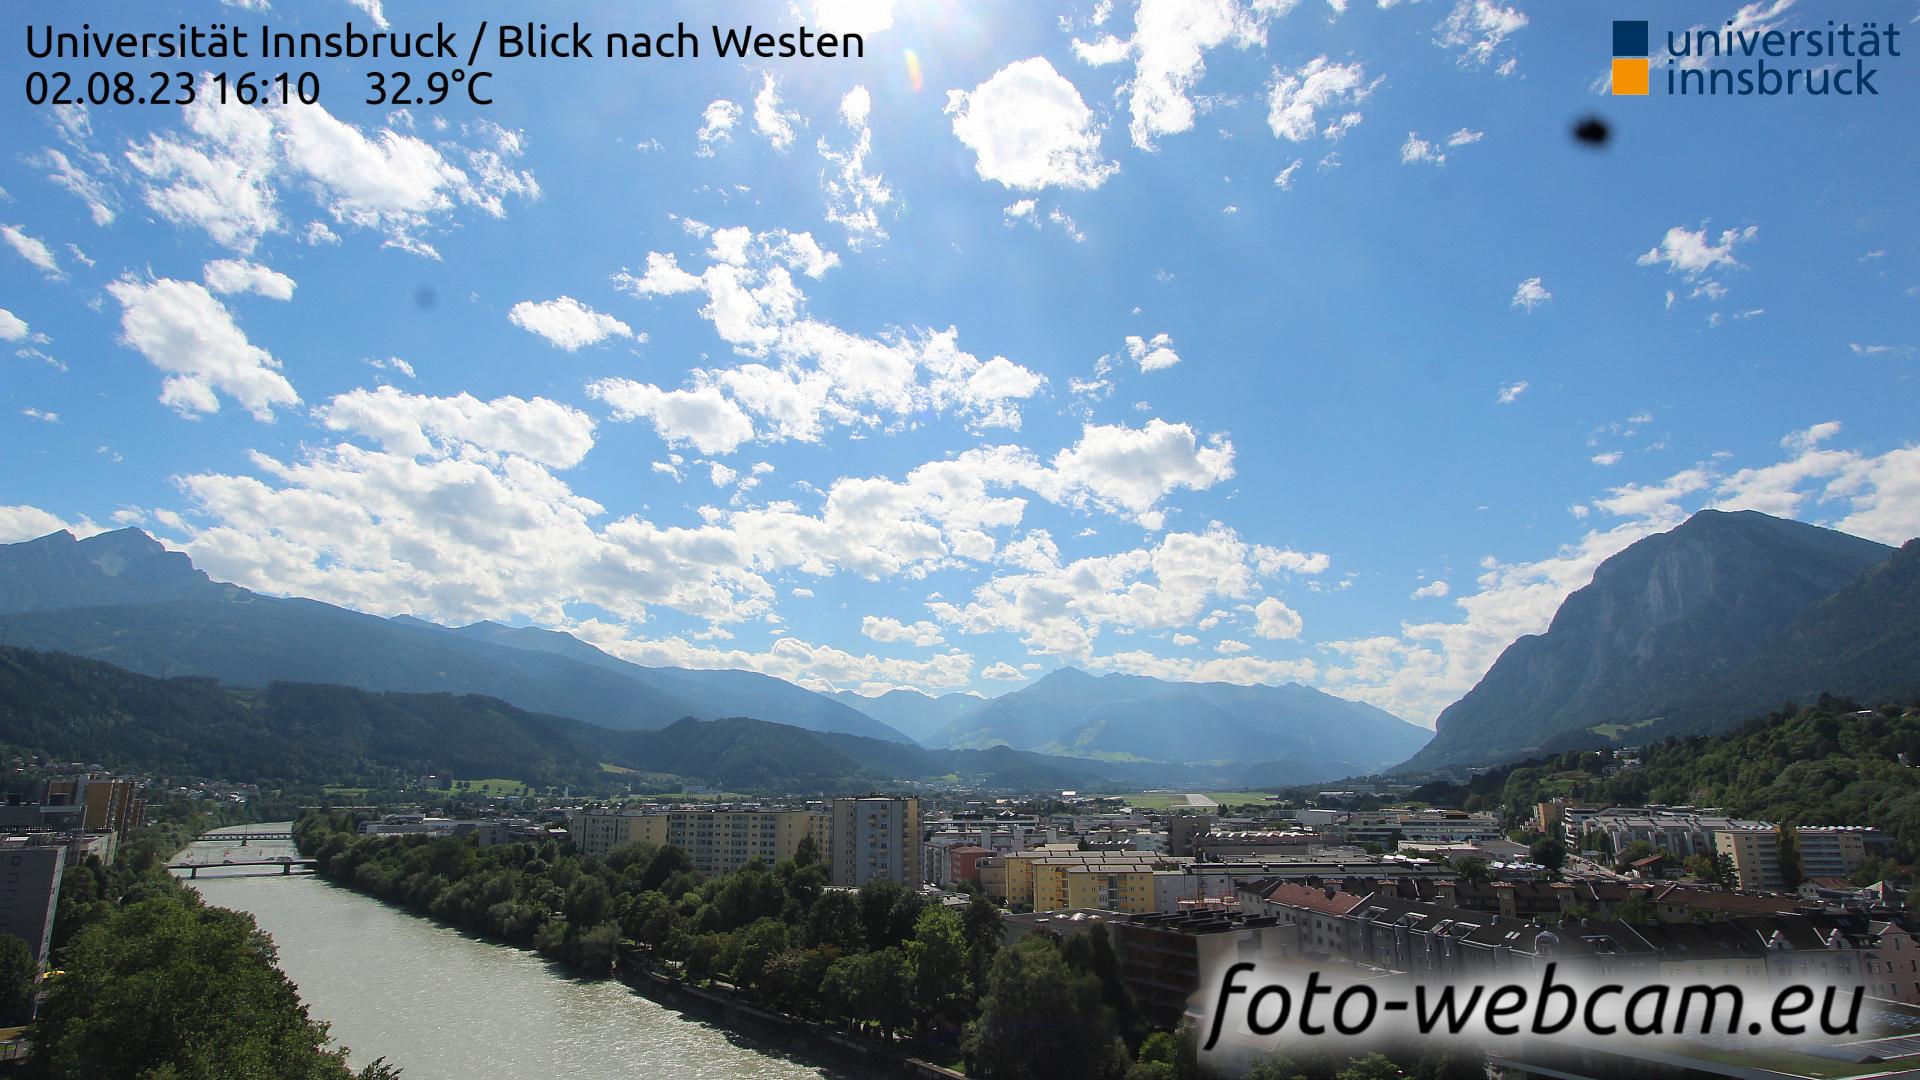 Innsbruck Sun. 16:25